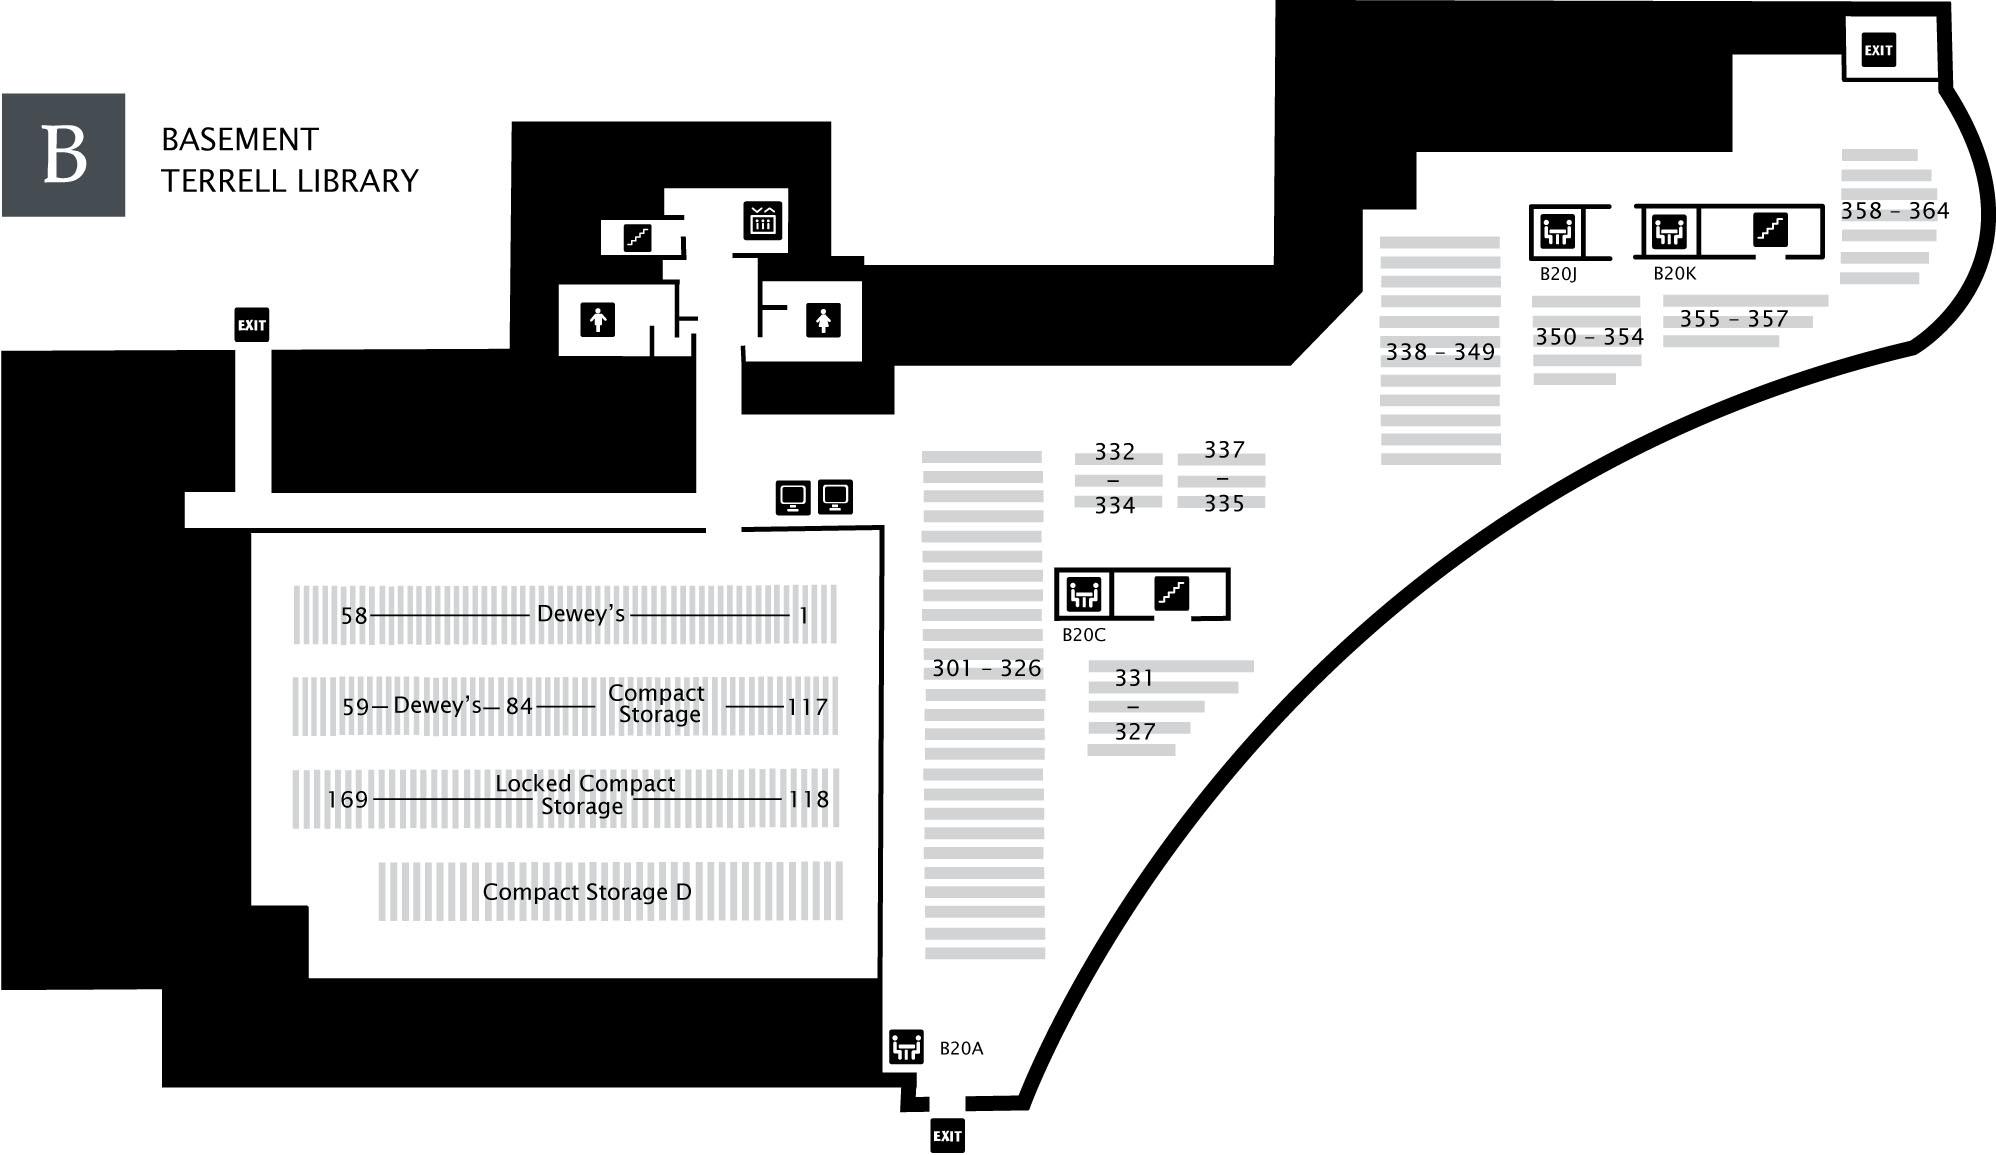 Terrell Library Basement Floor Map